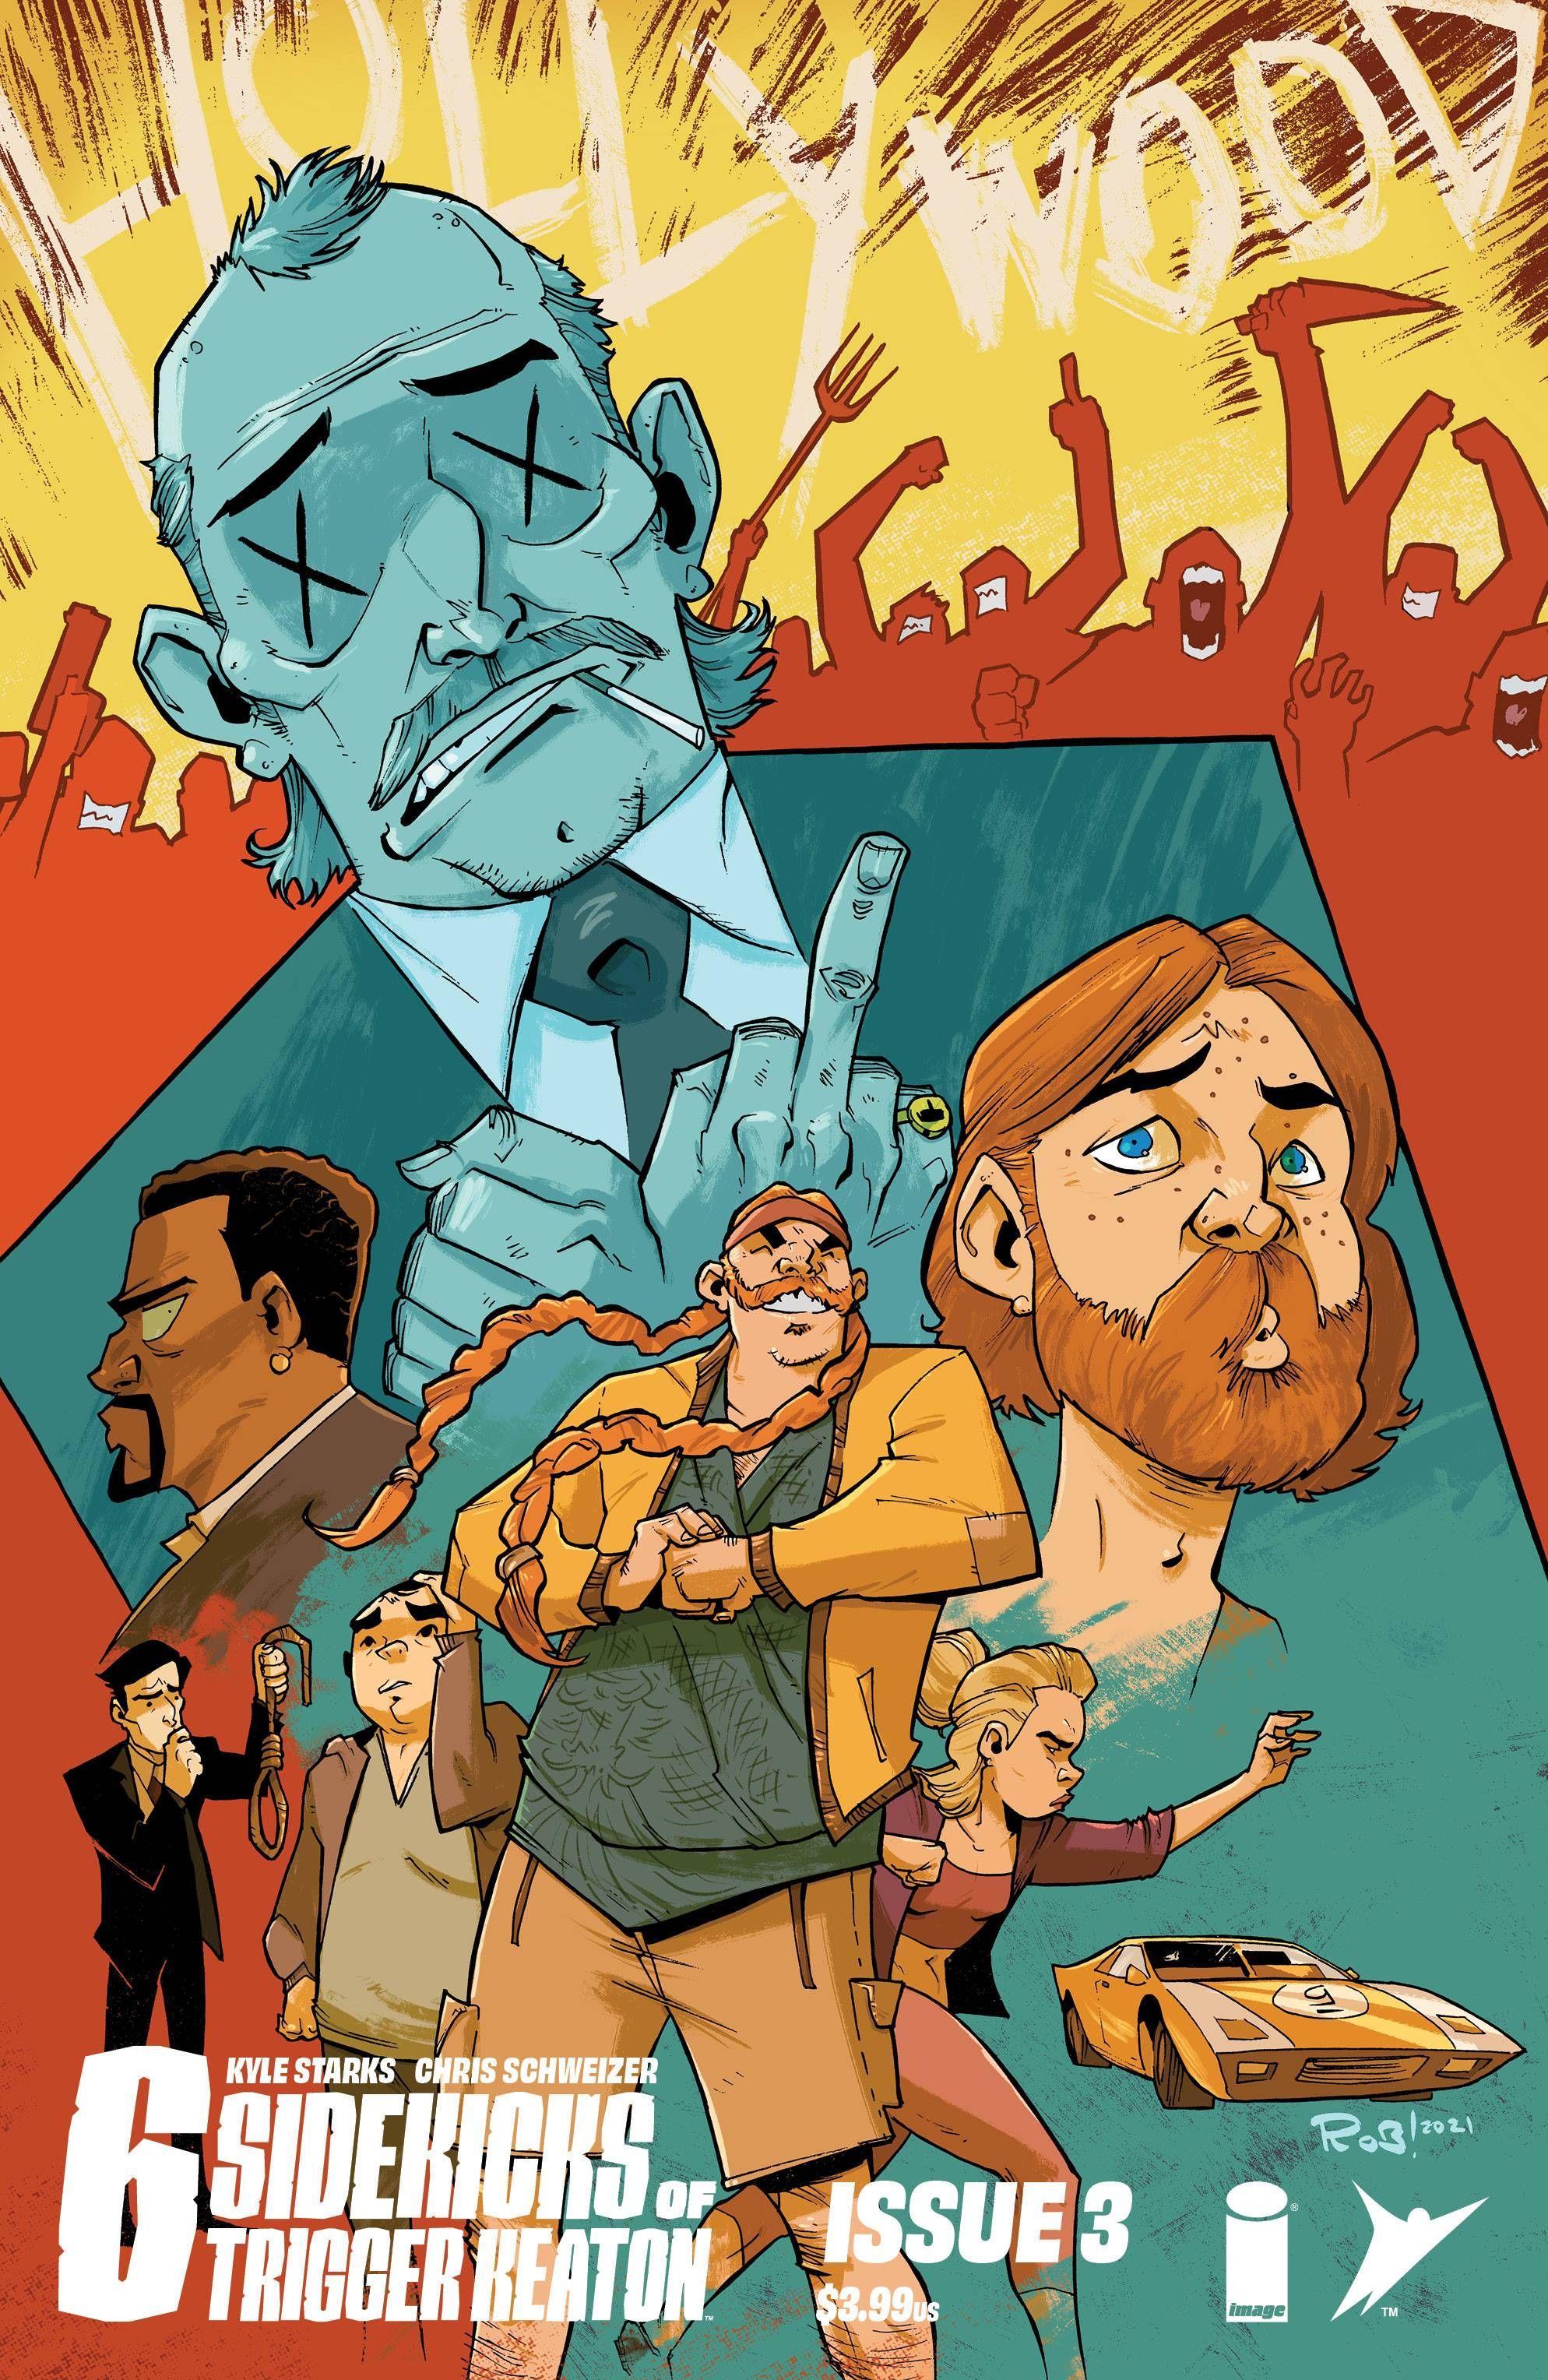 eyJidWNrZXQiOiJnb2NvbGxlY3QuaW1hZ2VzLnB1YiIsImtleSI6ImJiYzA3YzQ0LWJkZjktNGQyNy04ZTk3LTgyZGQ5MzI5MzM2Yy5qcGciLCJlZGl0cyI6W119 ComicList: Image Comics New Releases for 08/11/2021